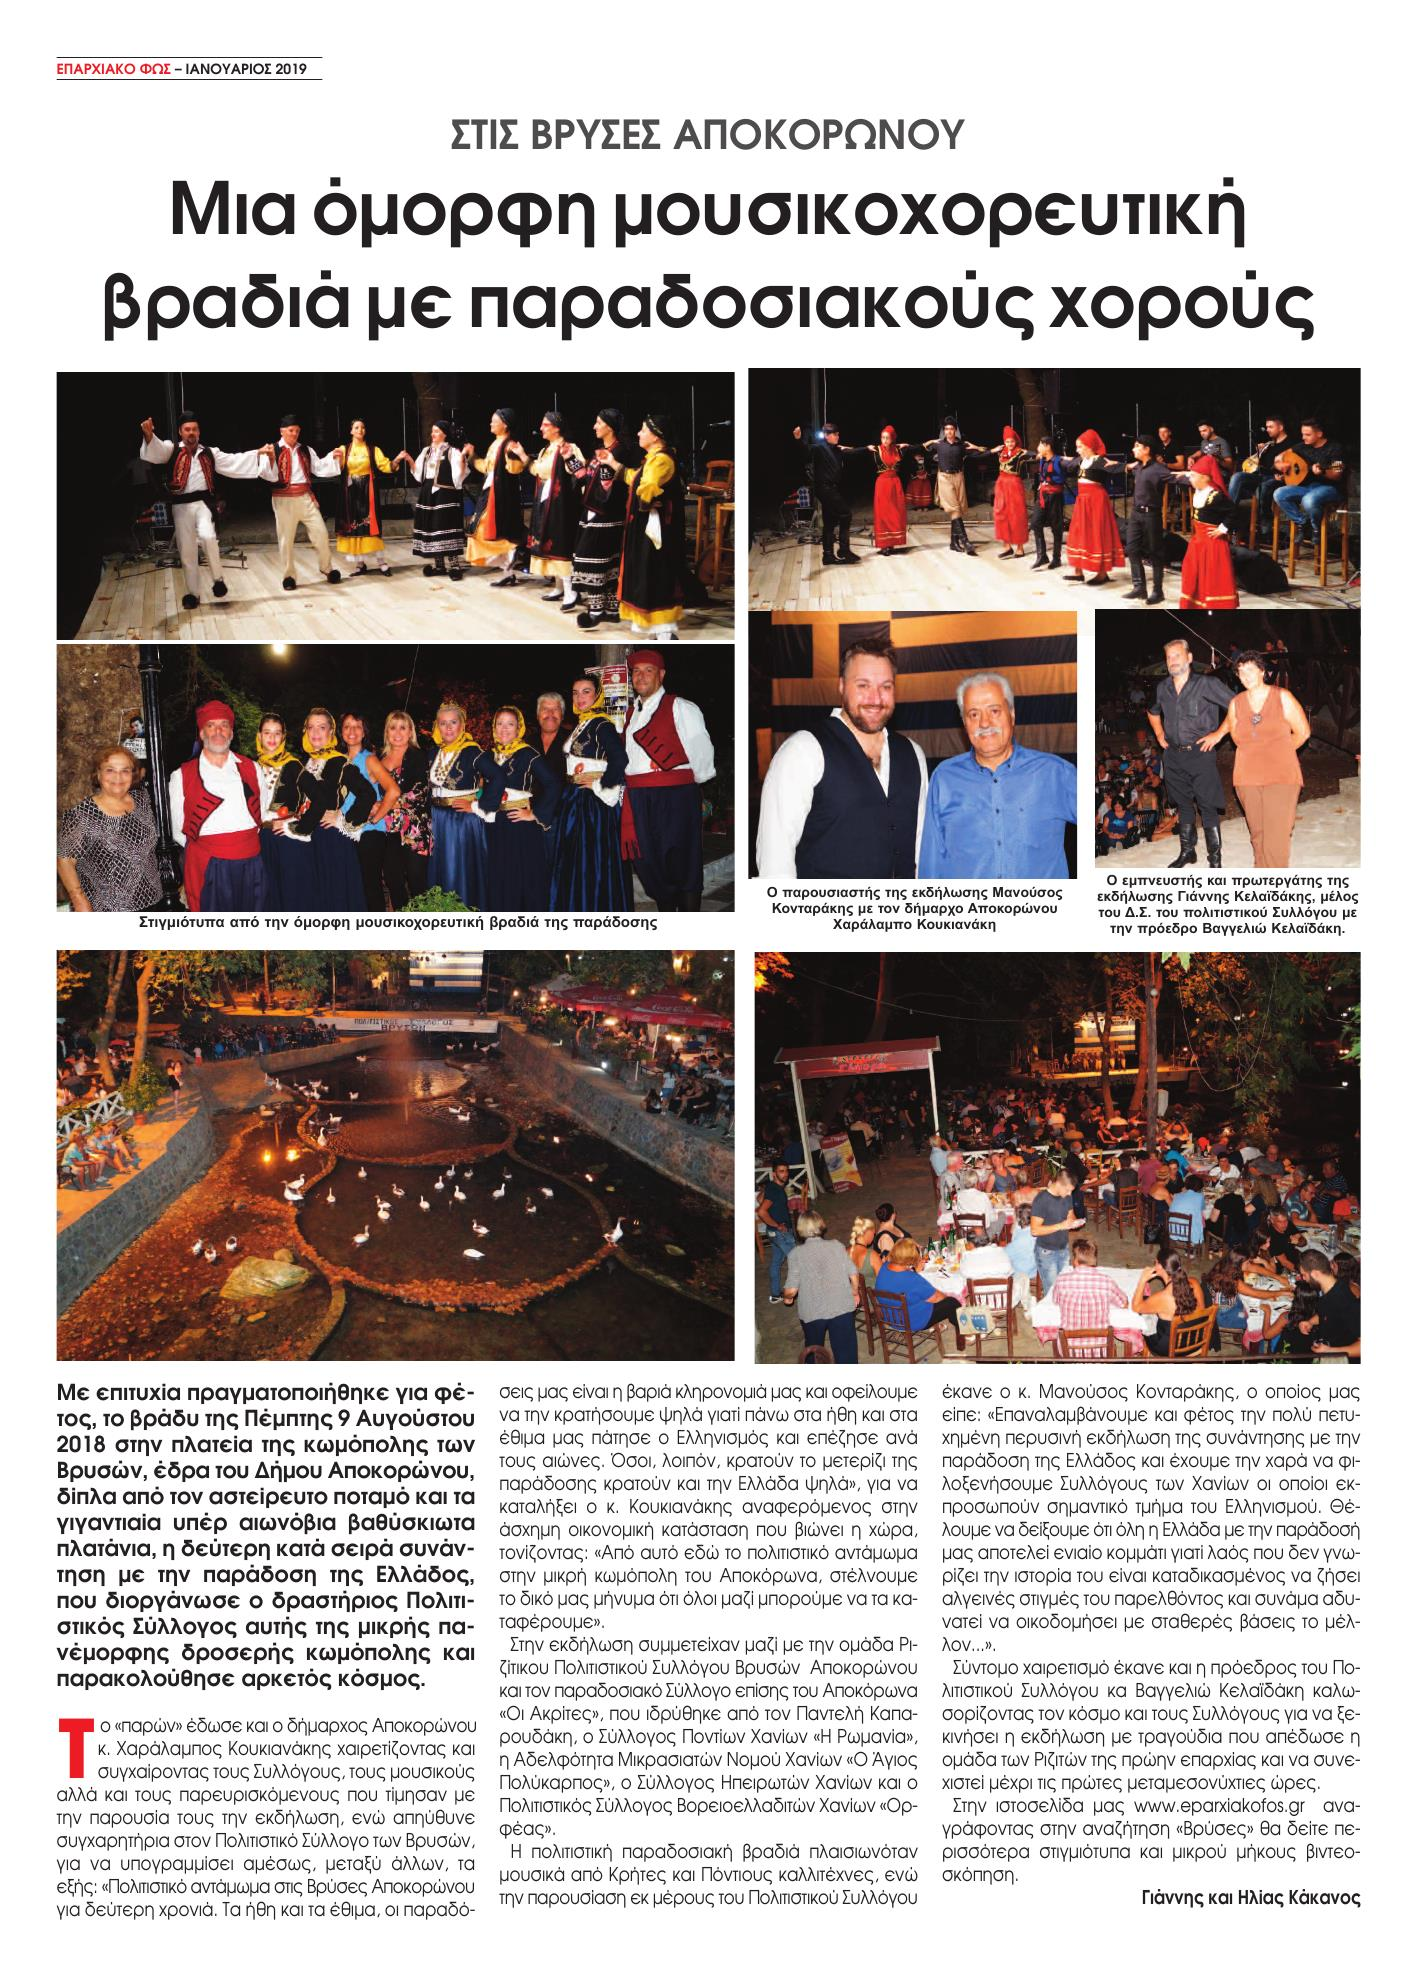 23 KAKANOULHS (Page 18)